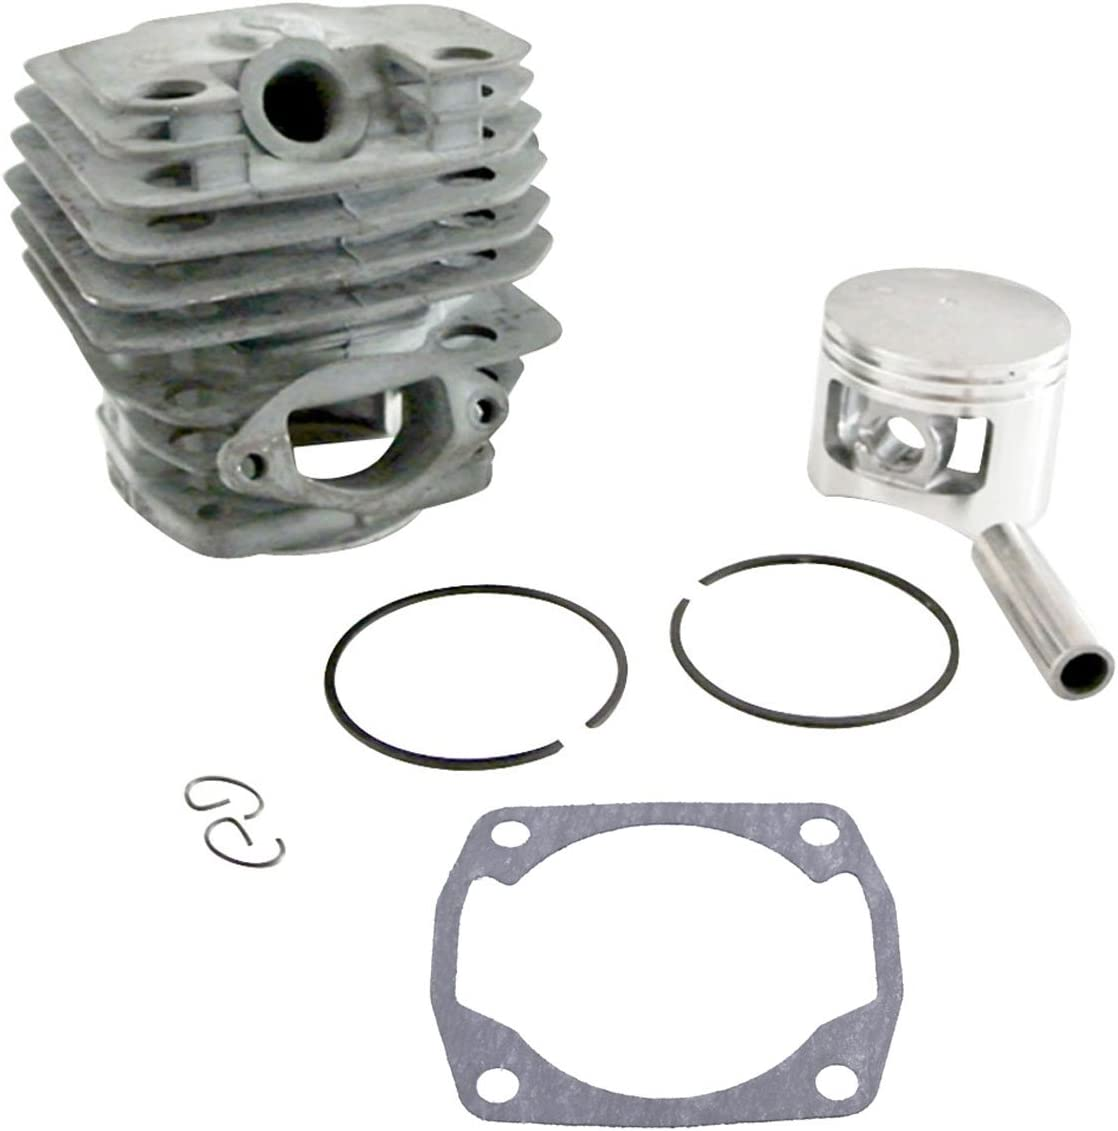 JRL Kit de Pistón cilíndrico para Motores DE 45 mm para Chino 5200 52 CC Motosierra Kiam Silverline